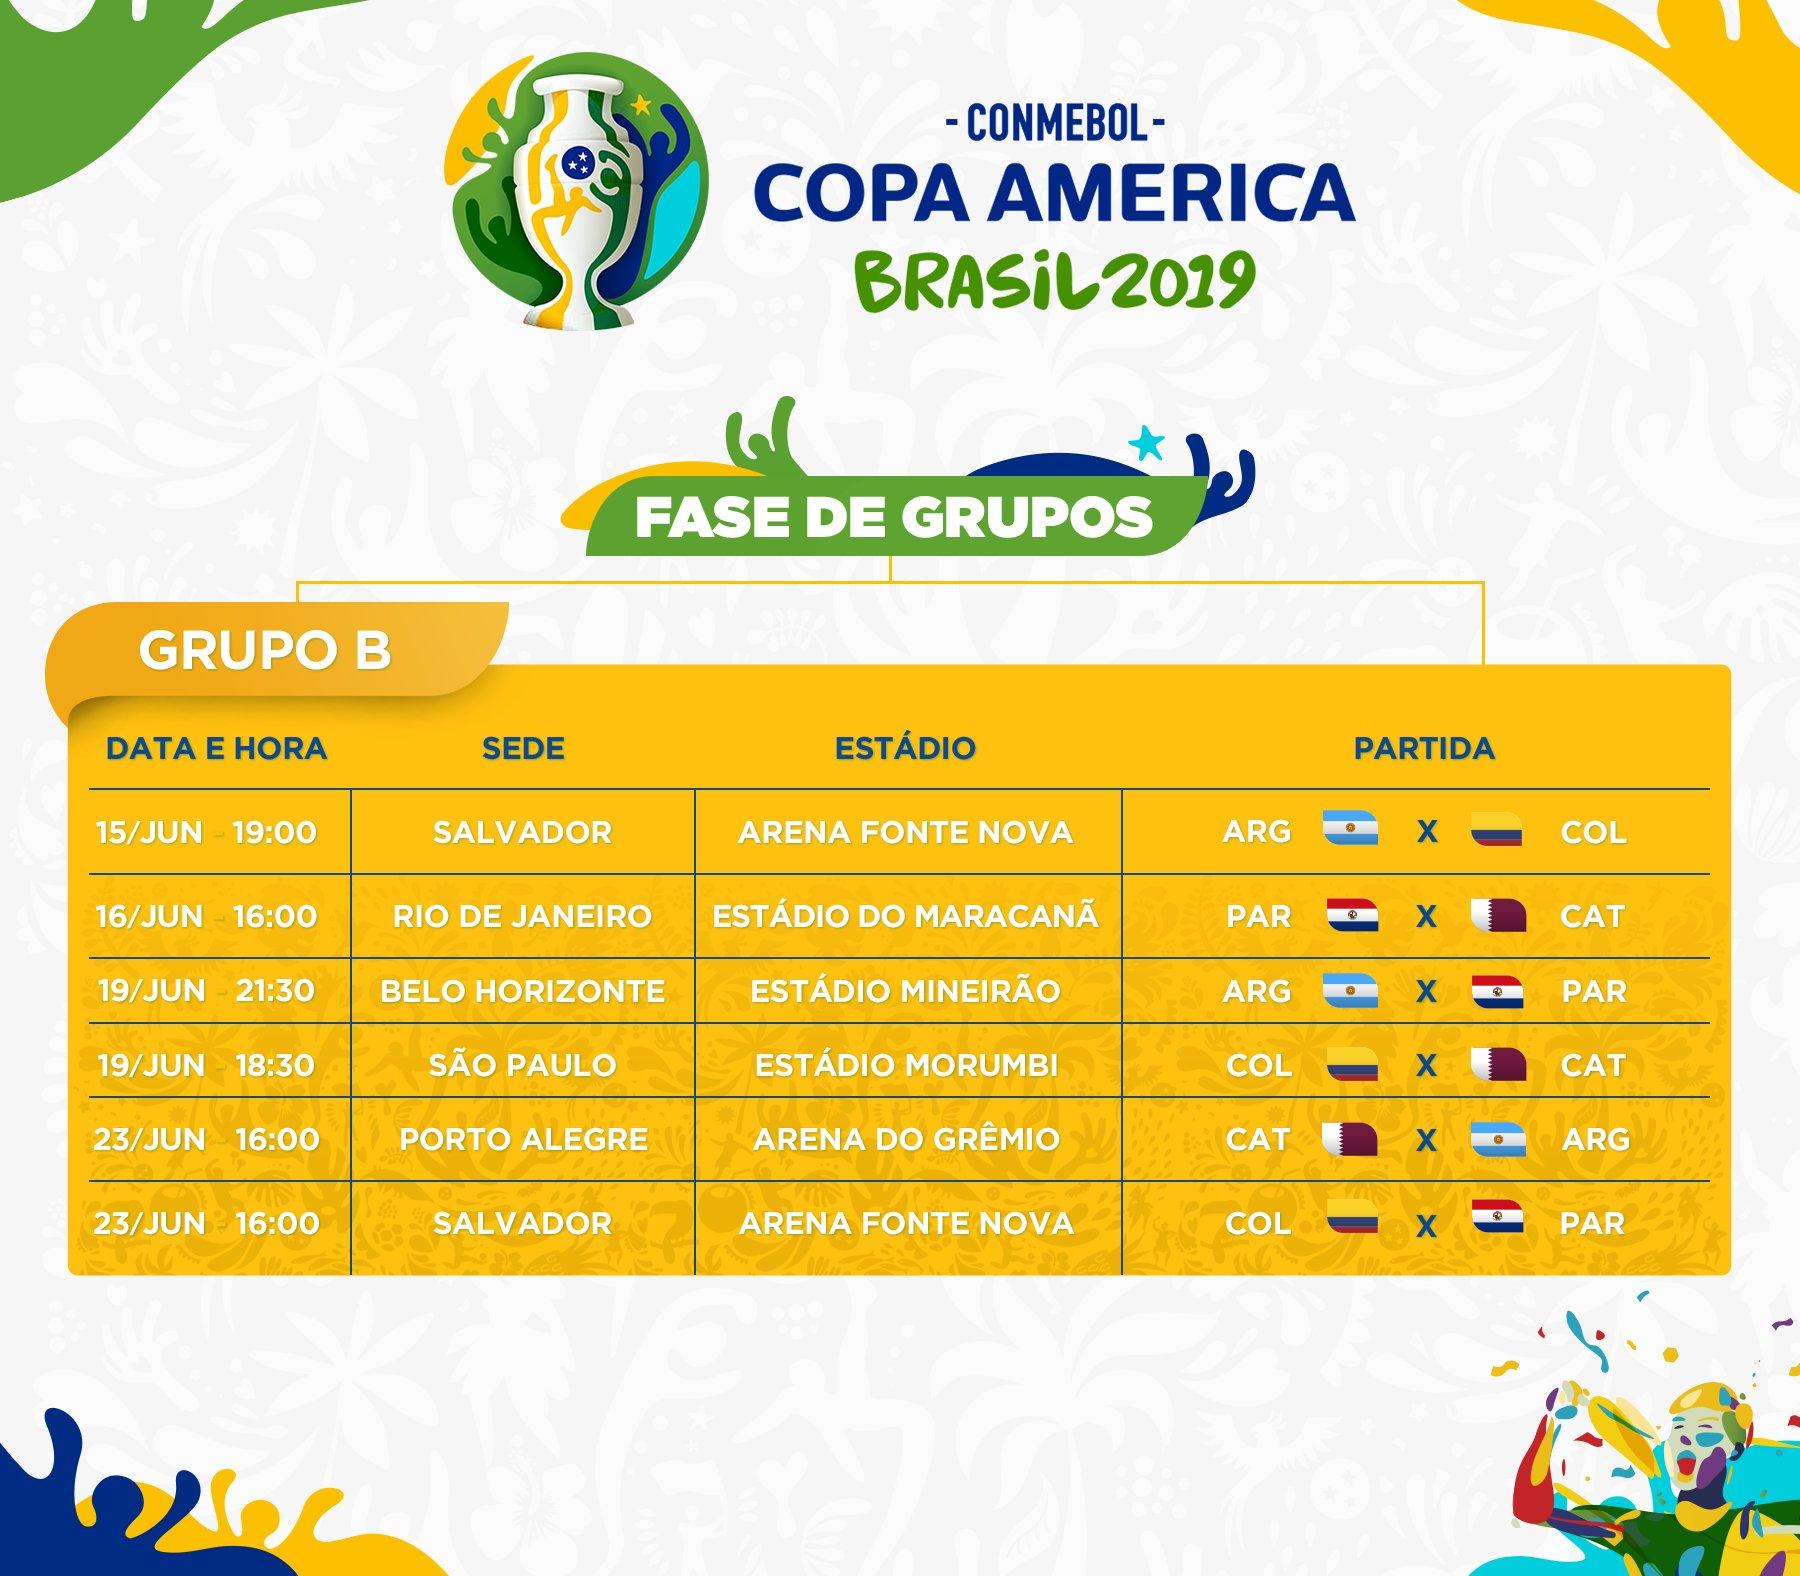 Calendario Copa.Calendario De La Copa America Piramide Invertida